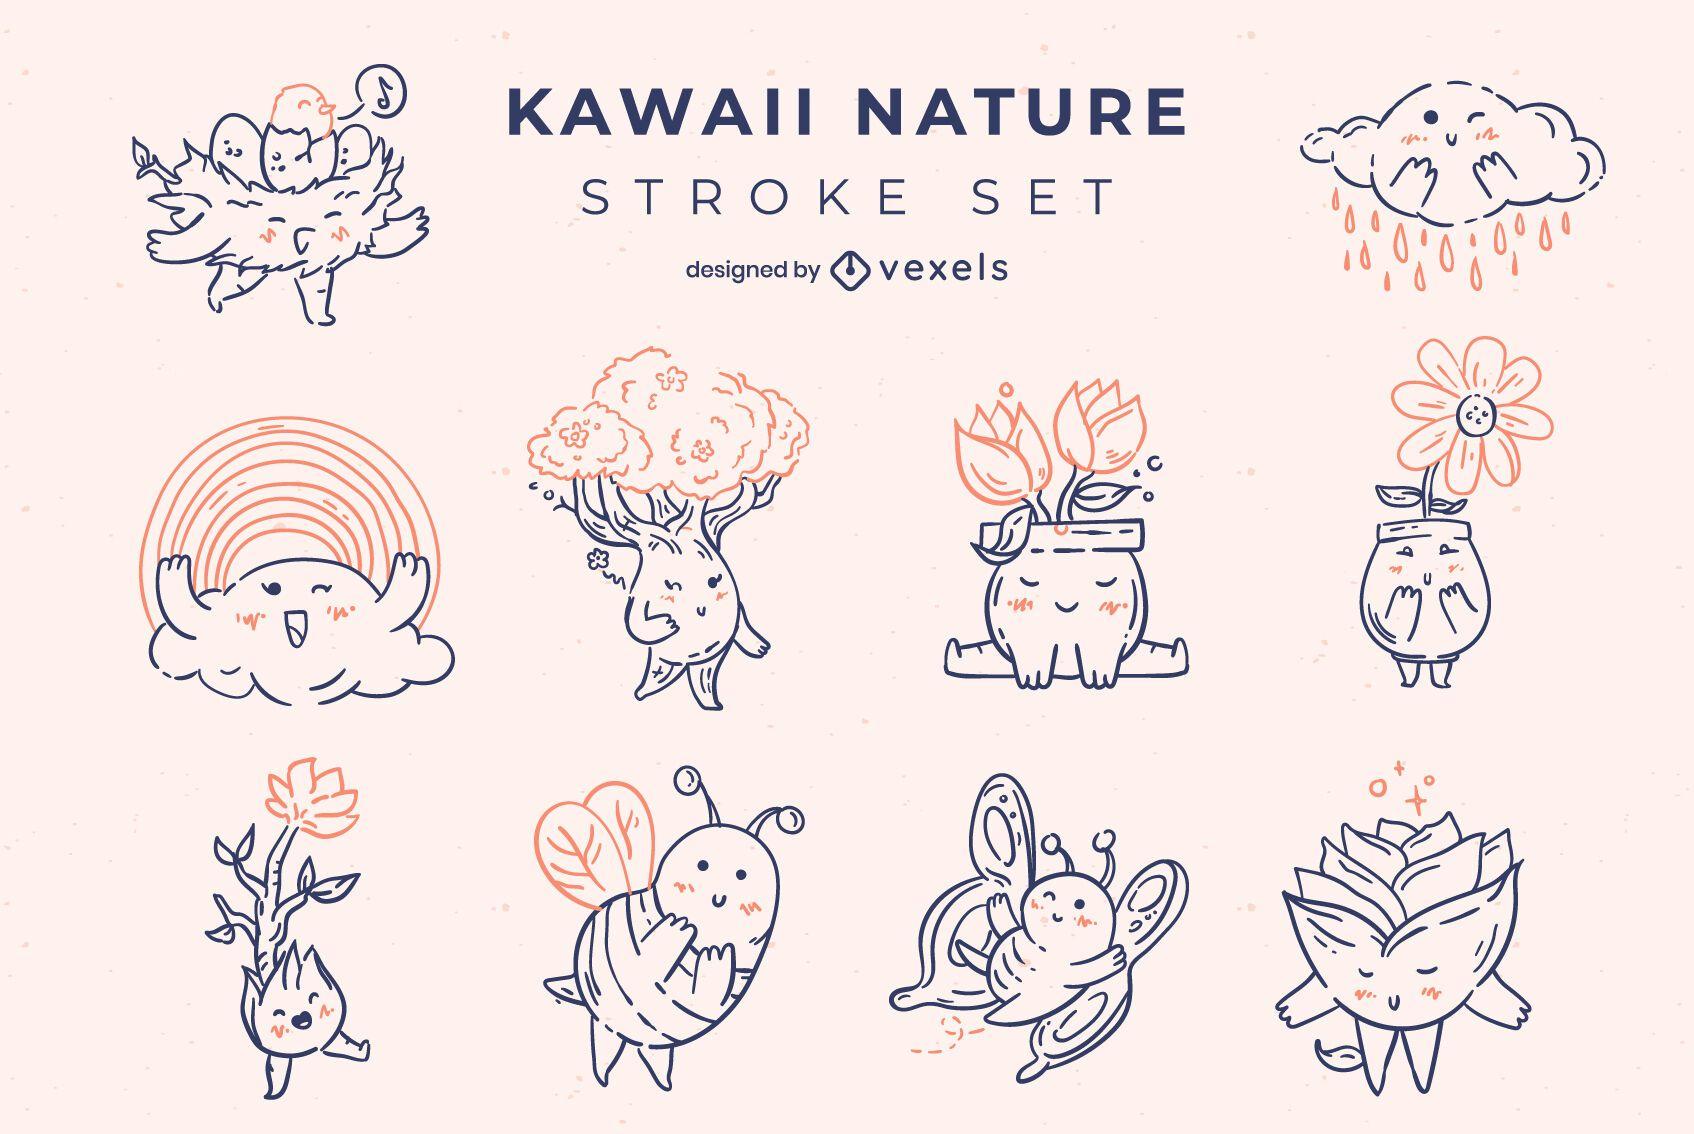 Kawaii nature stroke characters set